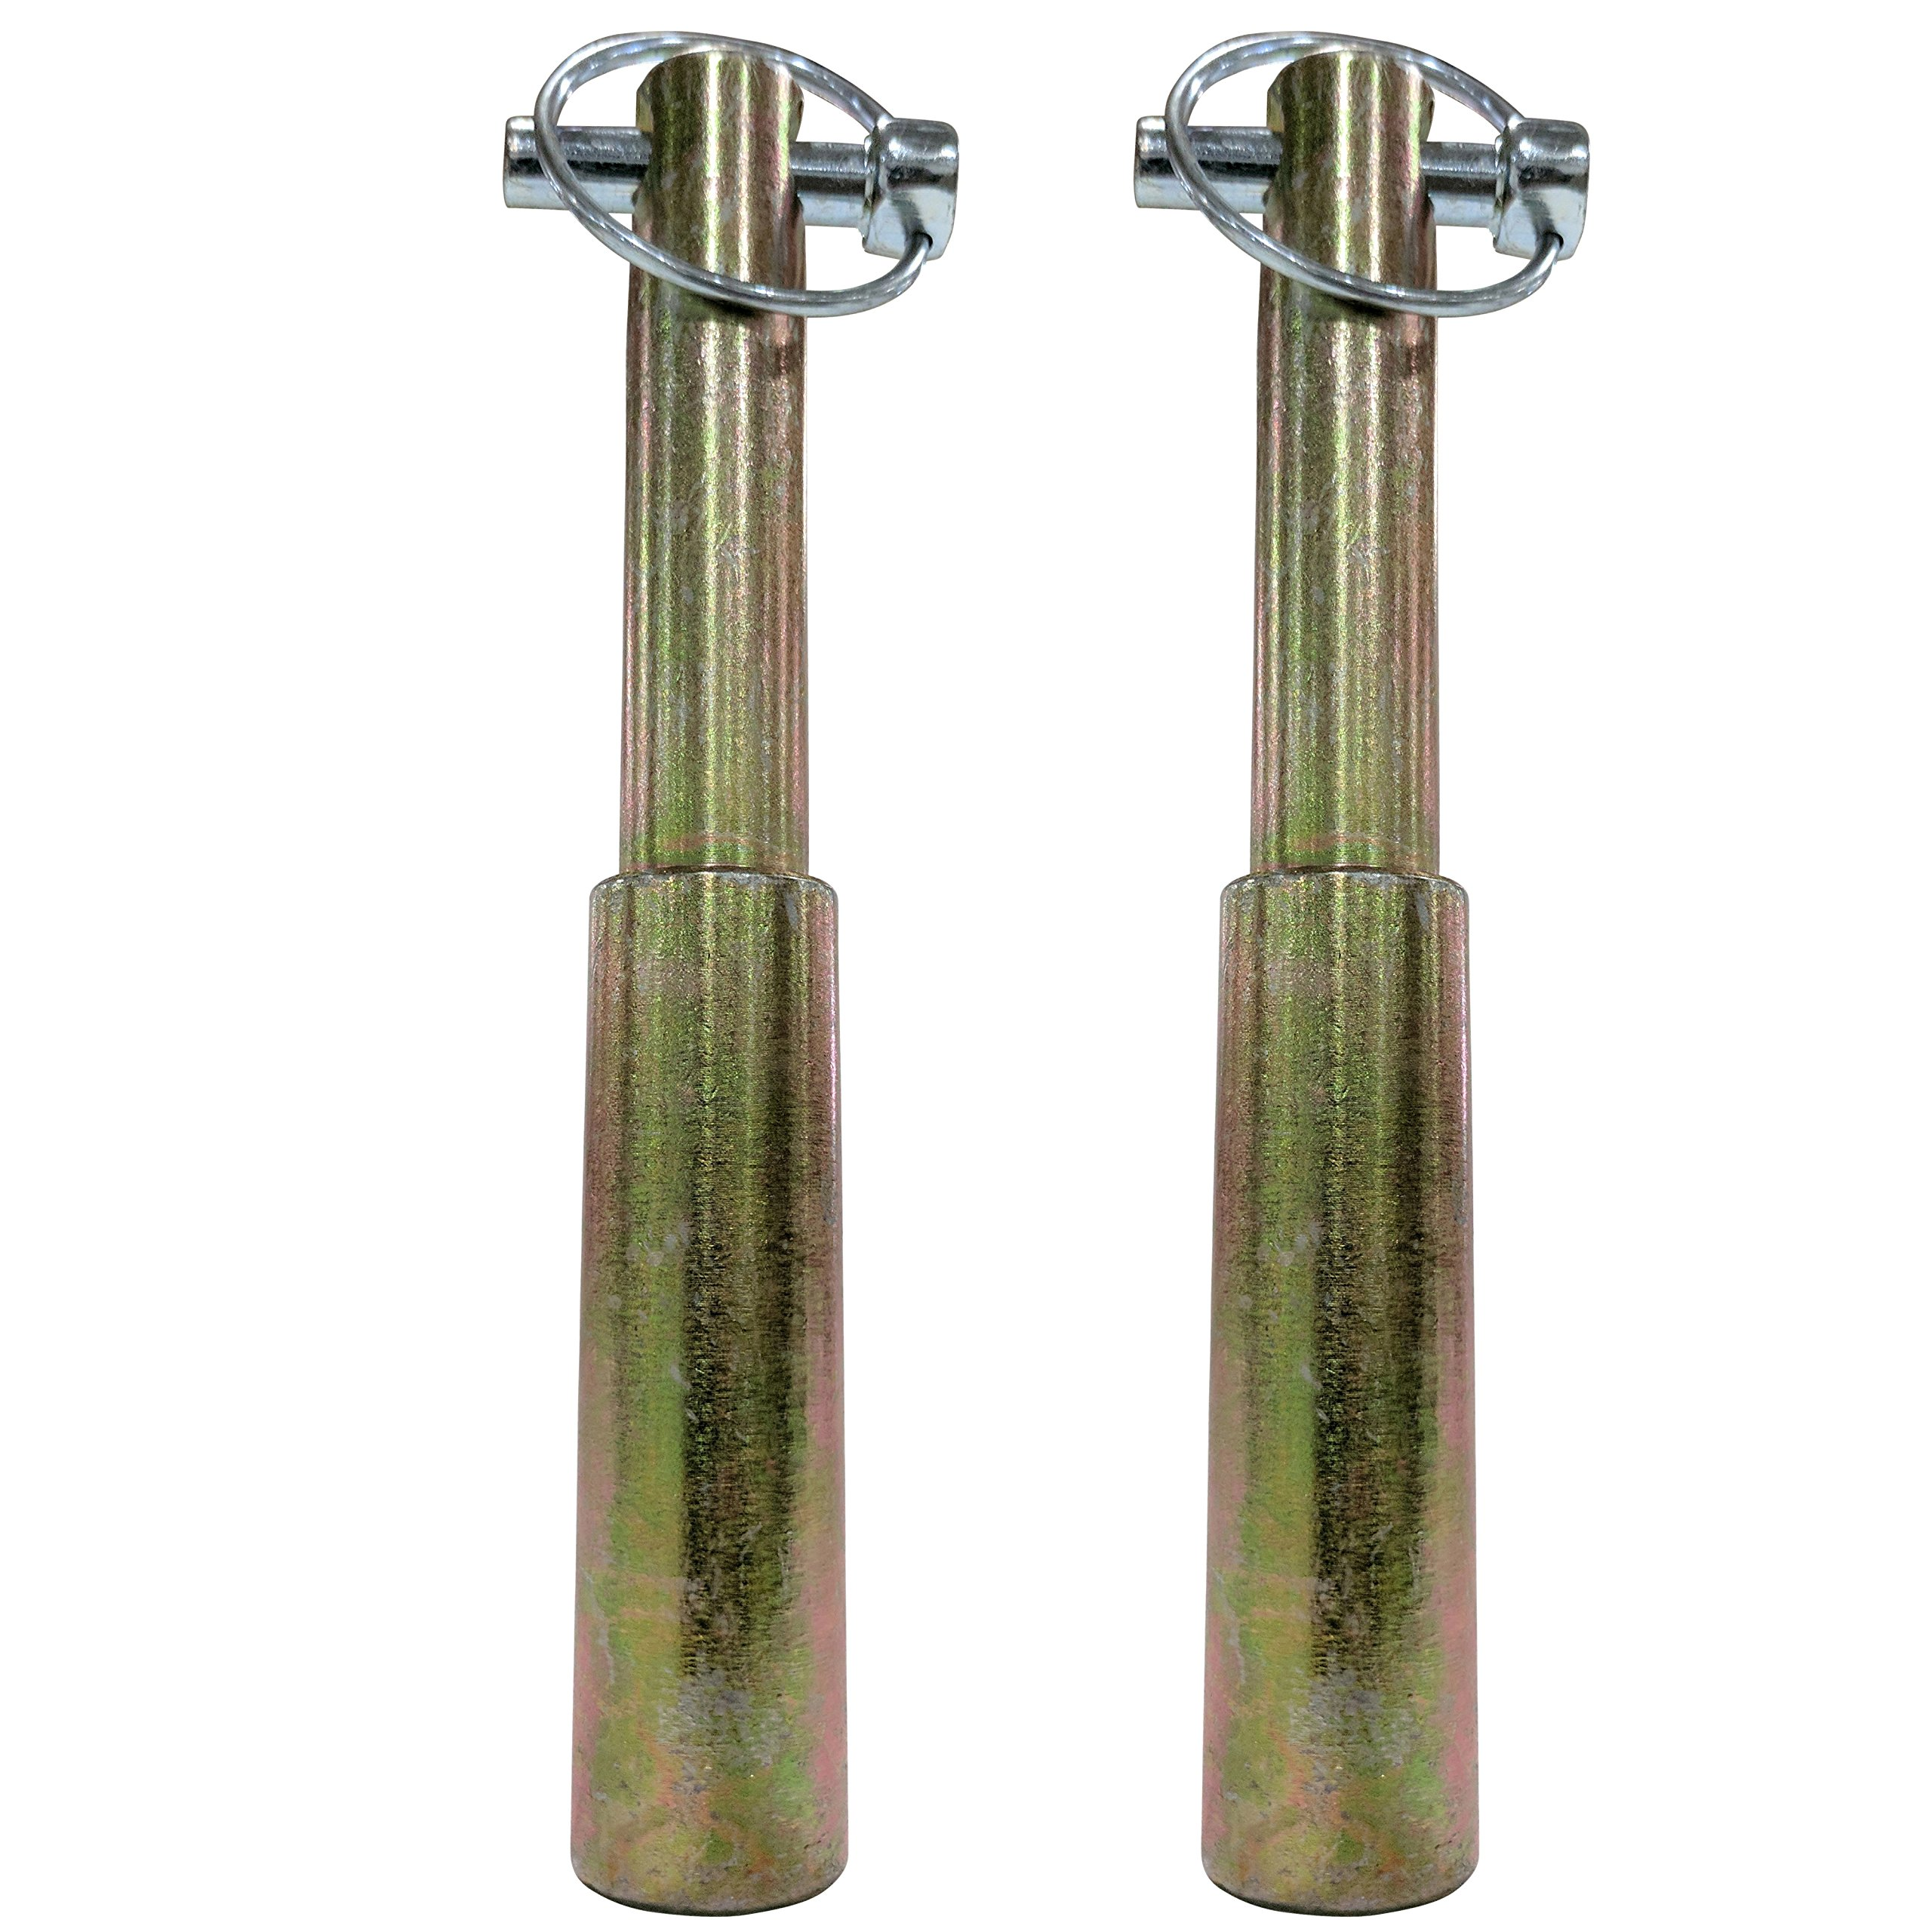 Titan (2) Stepped Lower Lift Pin (CAT 1 & 2)